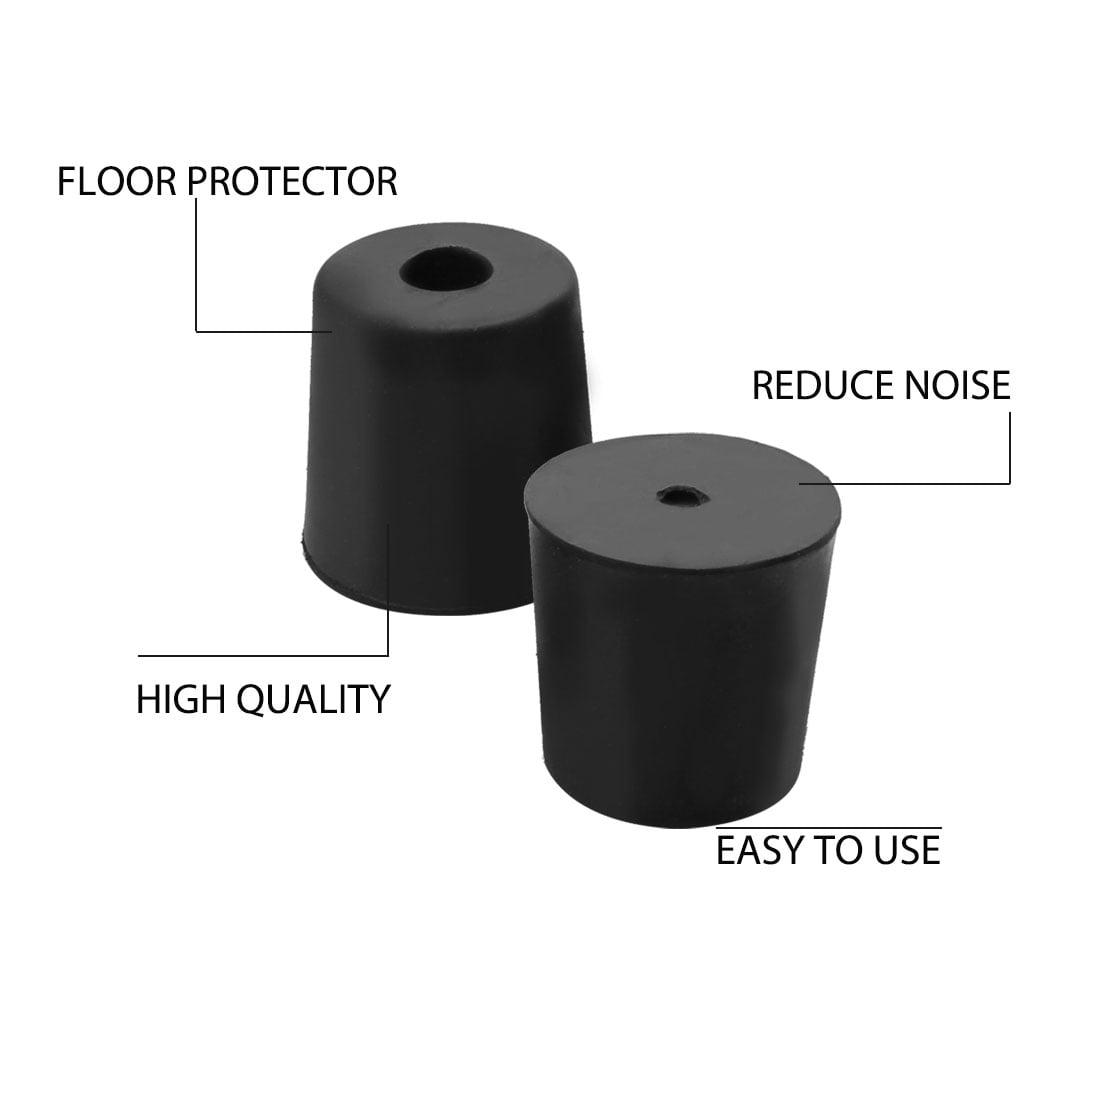 16pcs Rubber Feet Bumper Amplifier Air Compressor Cabinet Leg Pads, D33x28xH33mm - image 2 of 7